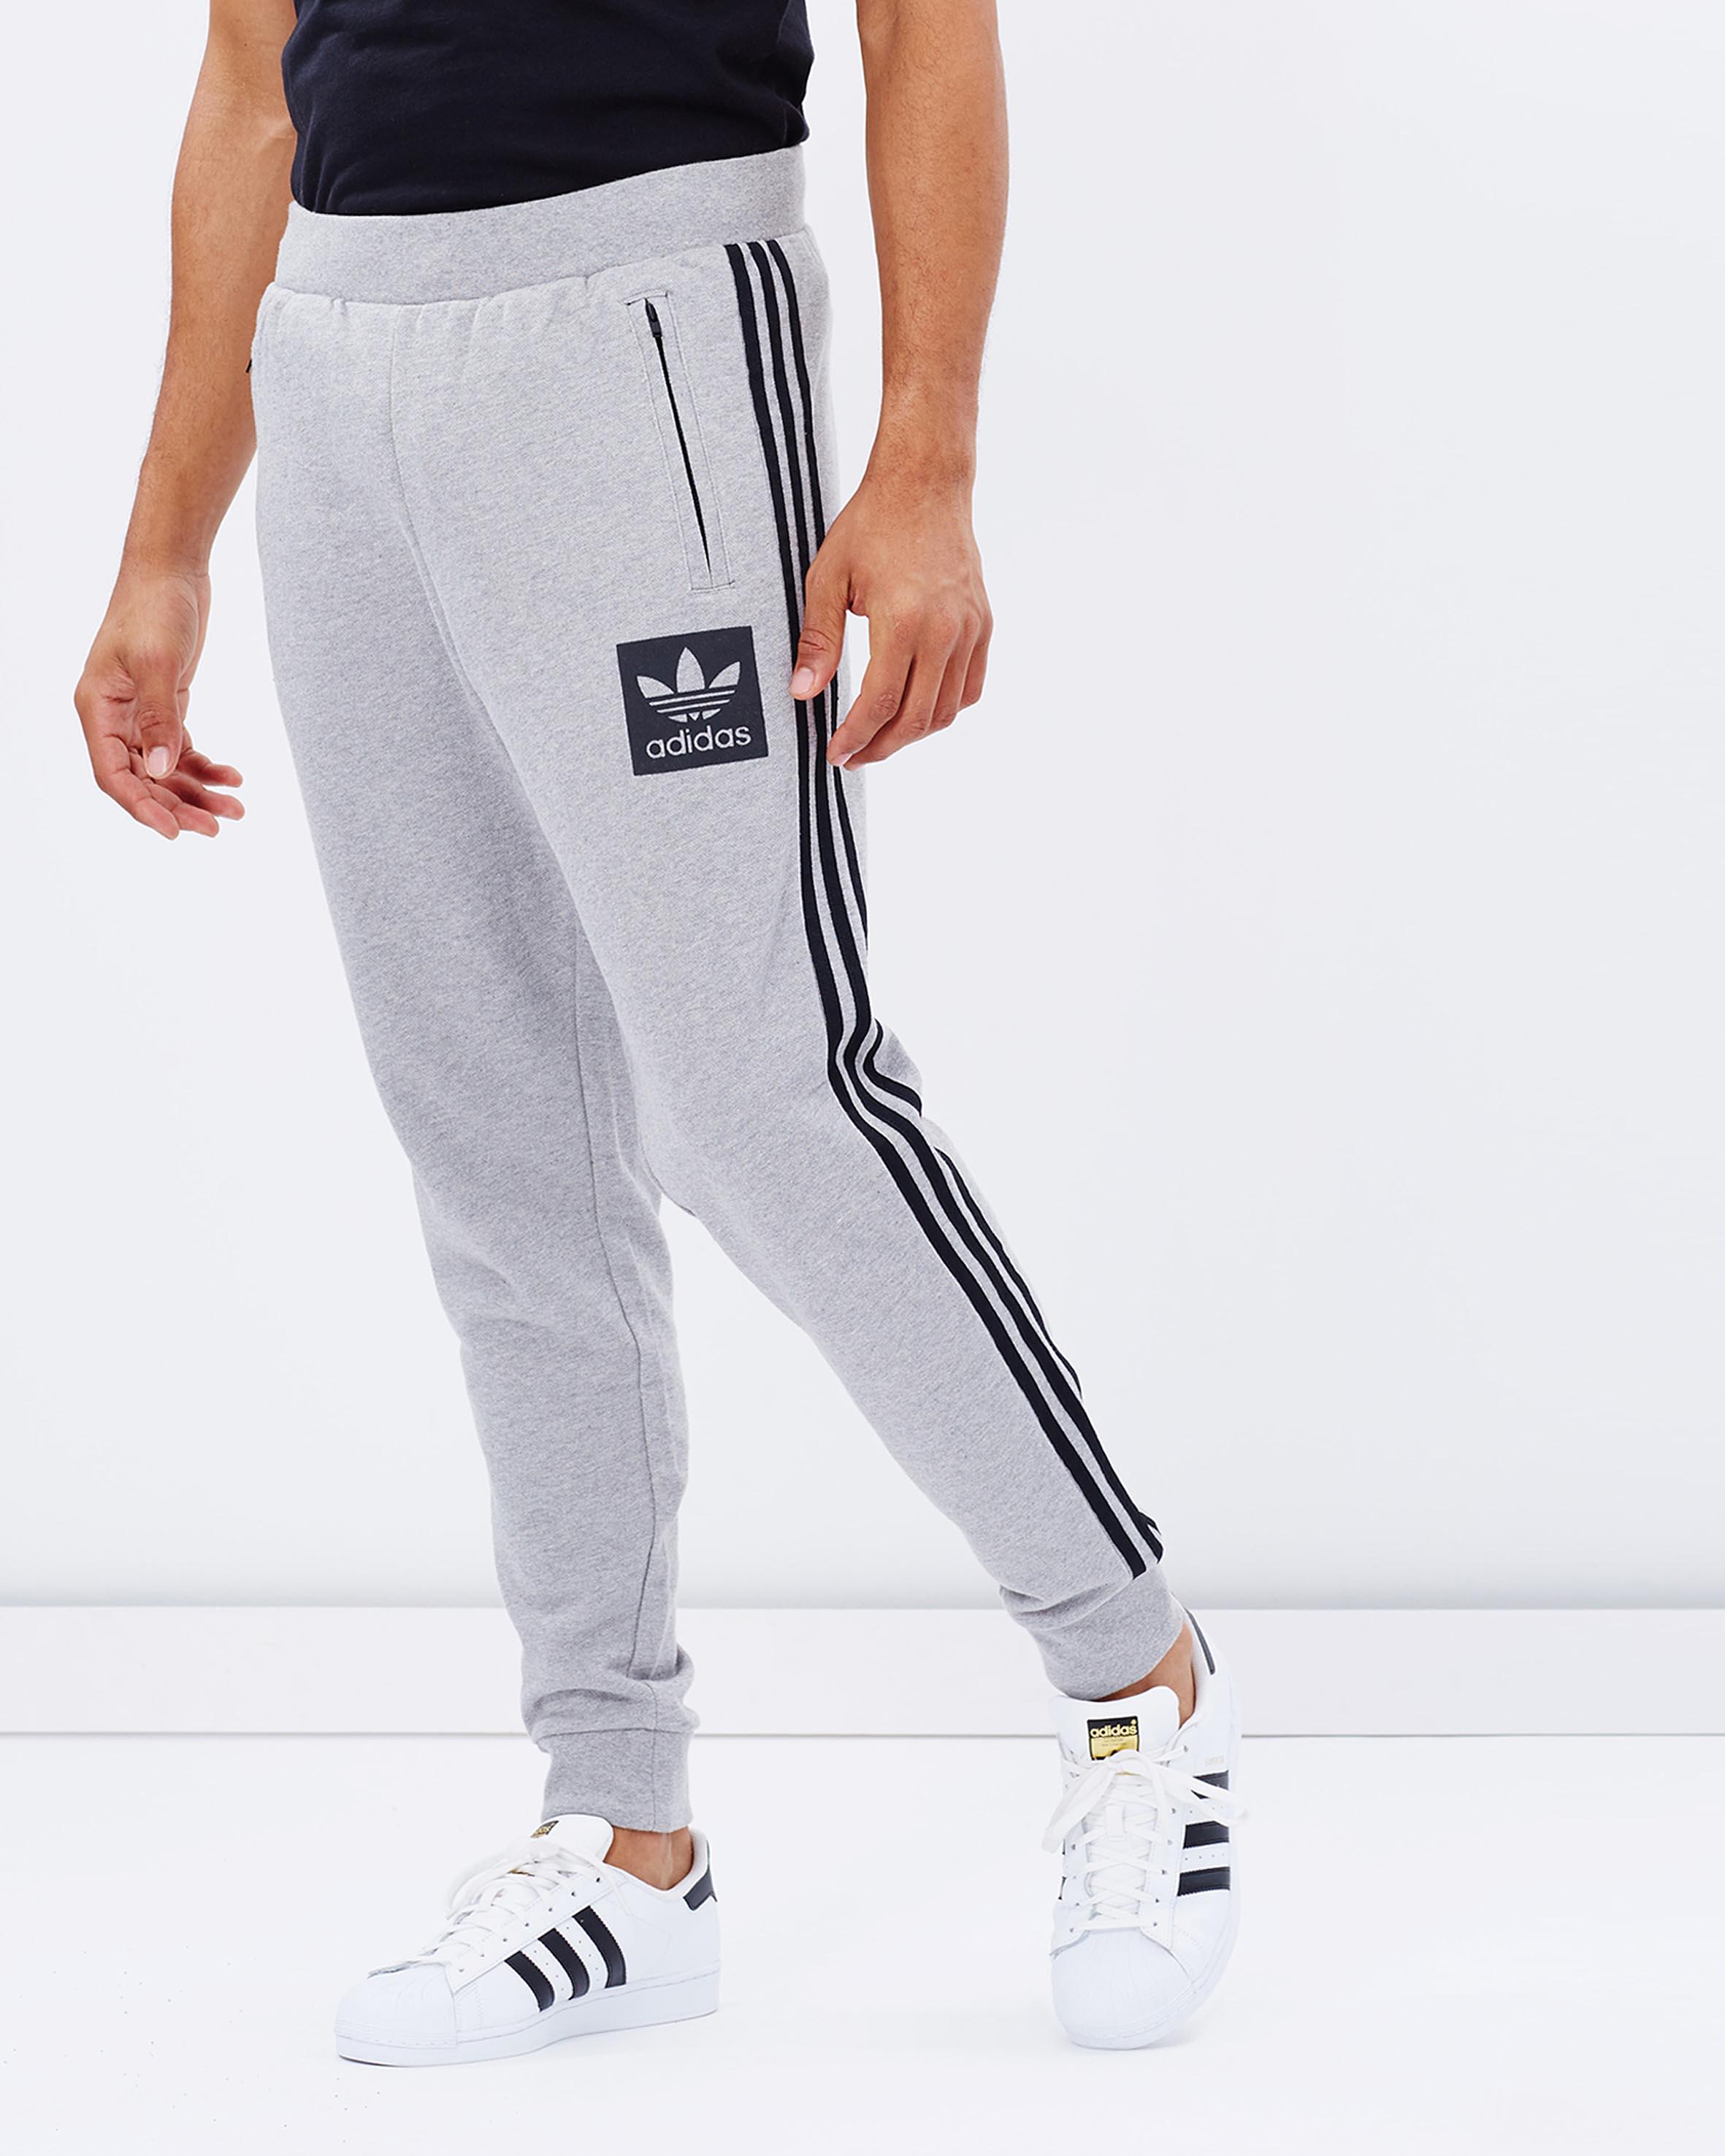 Buy adidas clothing online for Buy denim shirts online